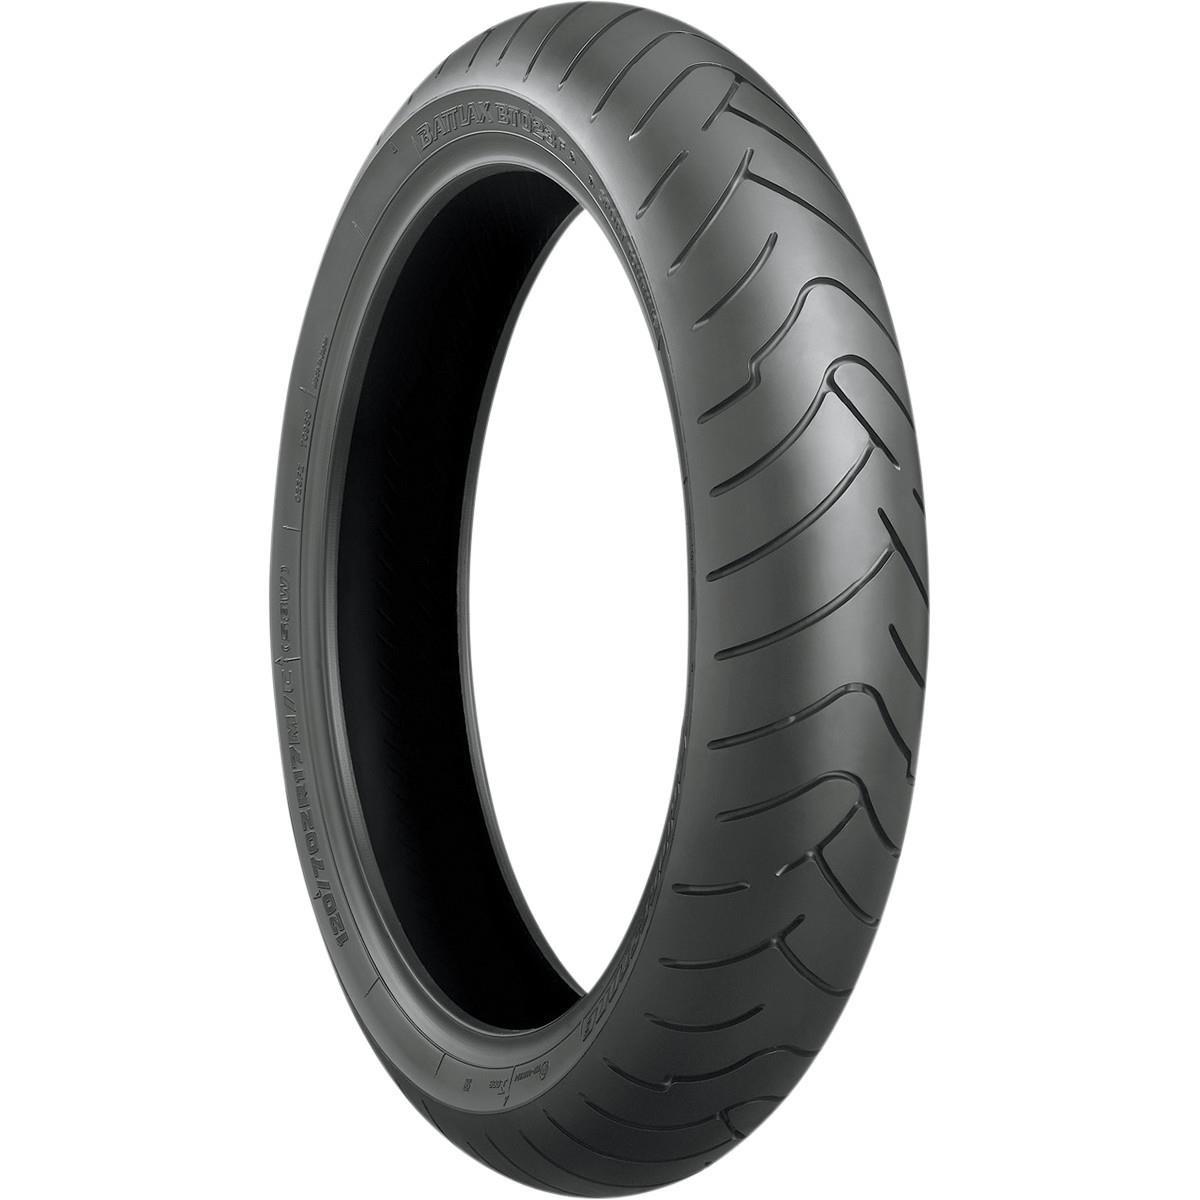 Tire Application: Touring 120// 70ZR-17 Tire Type: Street Speed Rating: Rim Size: 17 Position: Front W Bridgestone Battlax BT-023F Sport Touring Radial Tire Load Rating: 58 Tire Size: 120//70-17 Front Tire Construction: Radial 001279